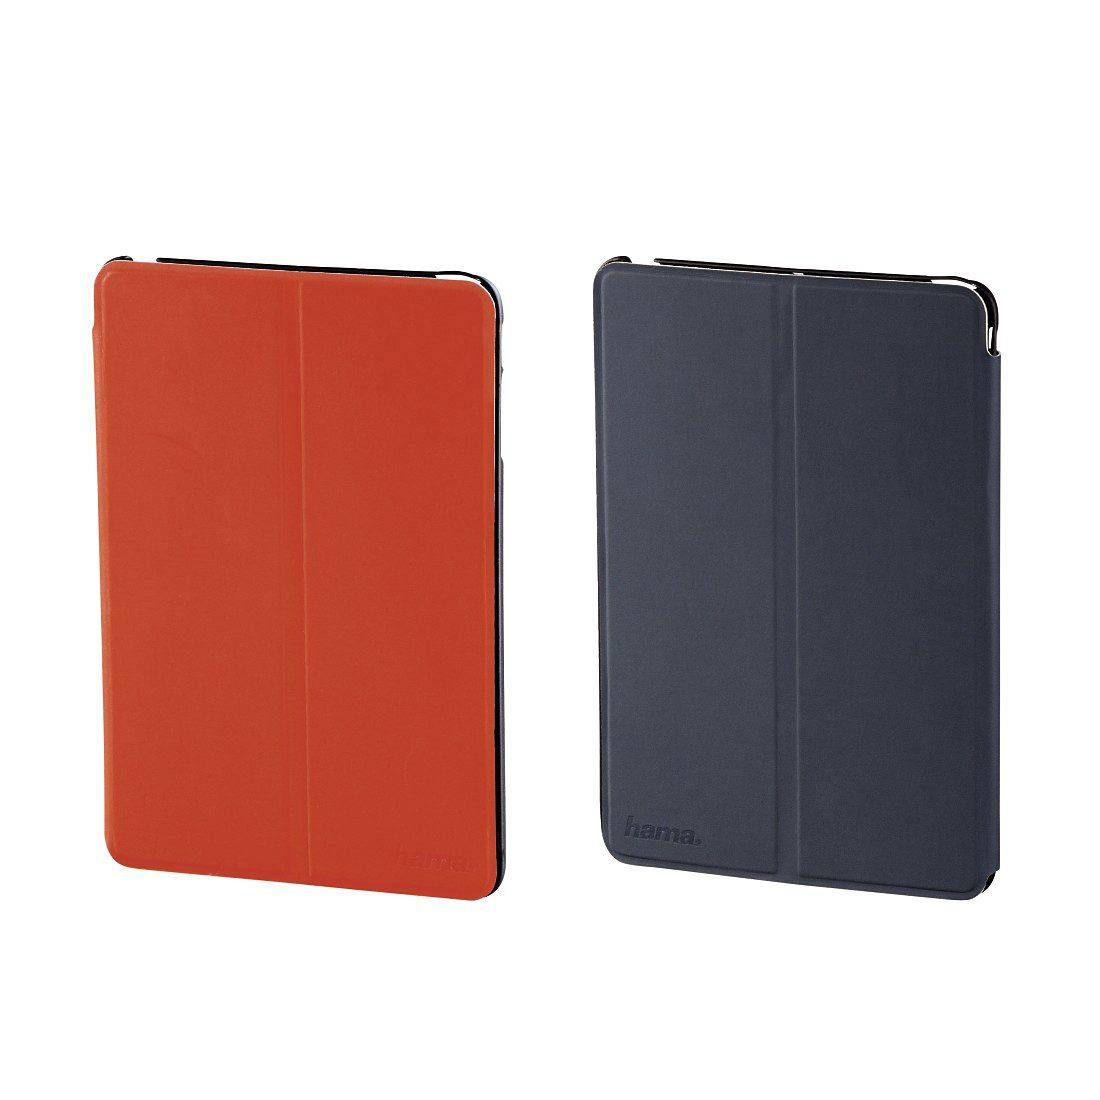 Hama Portfolio Twiddle für iPad Air, Orange/Grau